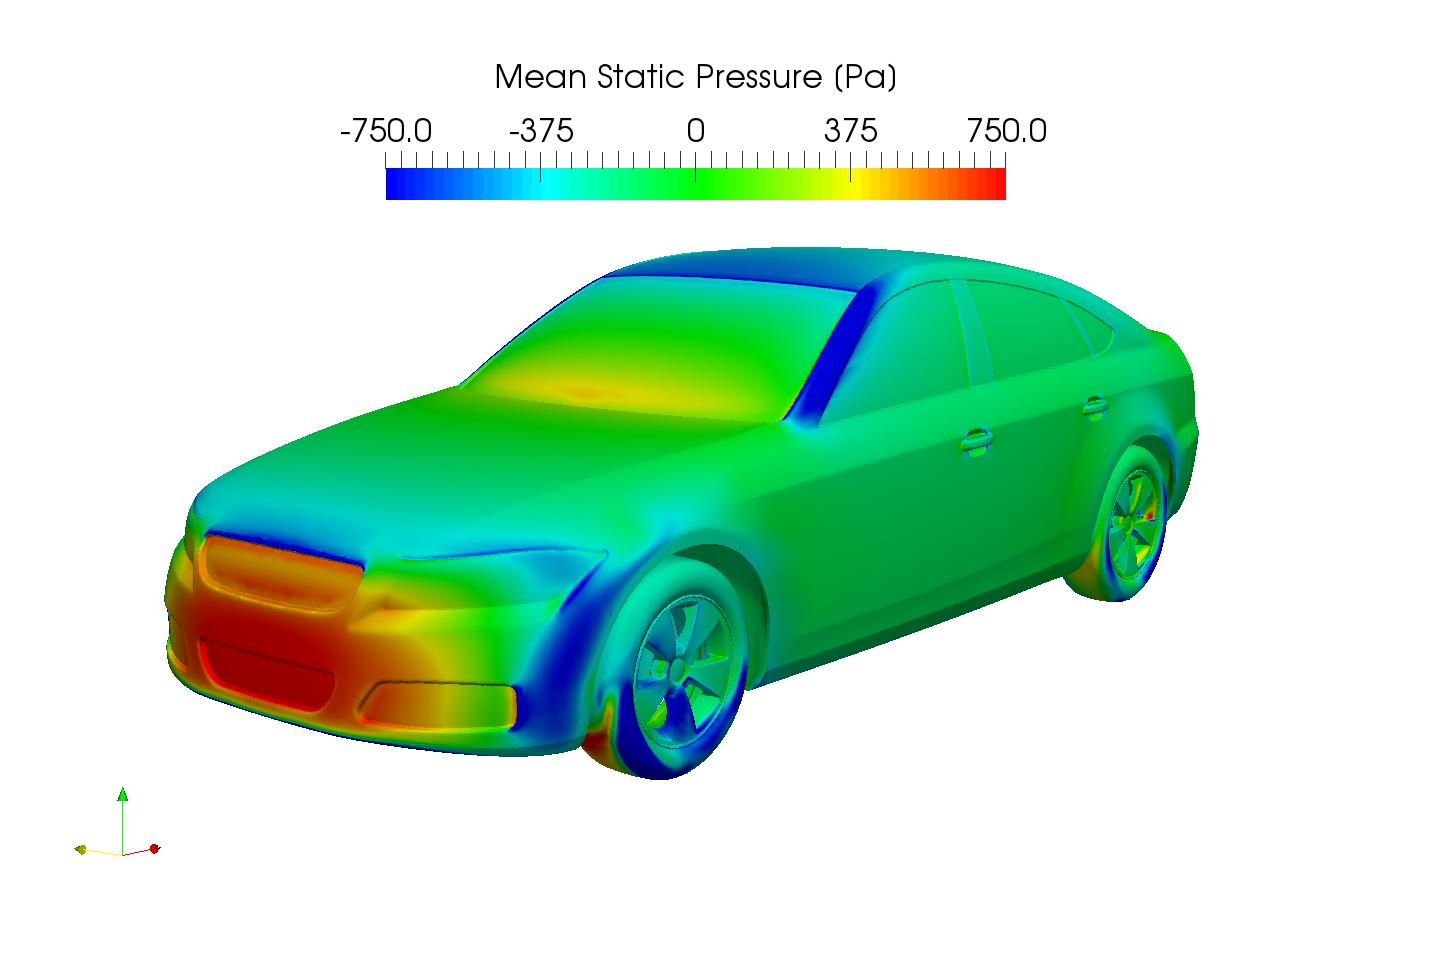 static pressure moving car computational fluid dynamics automotive